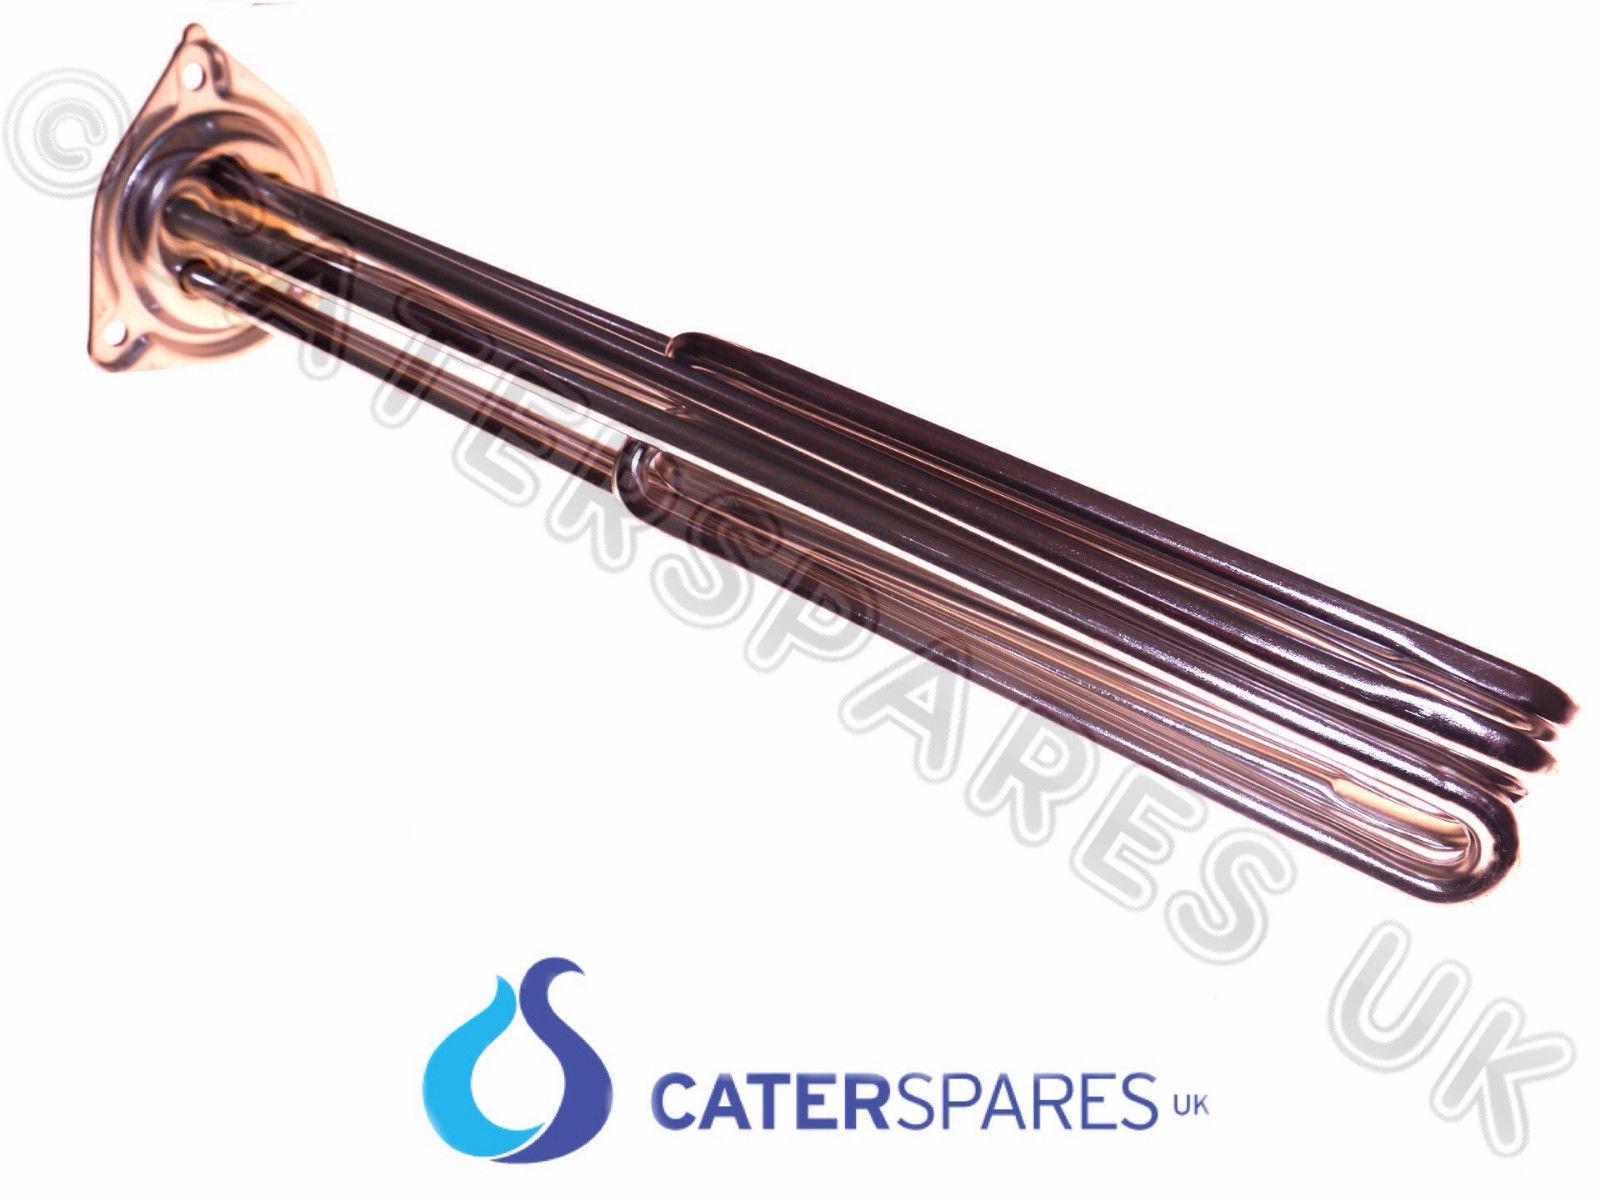 electrolux glasswasher. 0l2653 electrolux dish / glasswasher electrolux glasswasher e